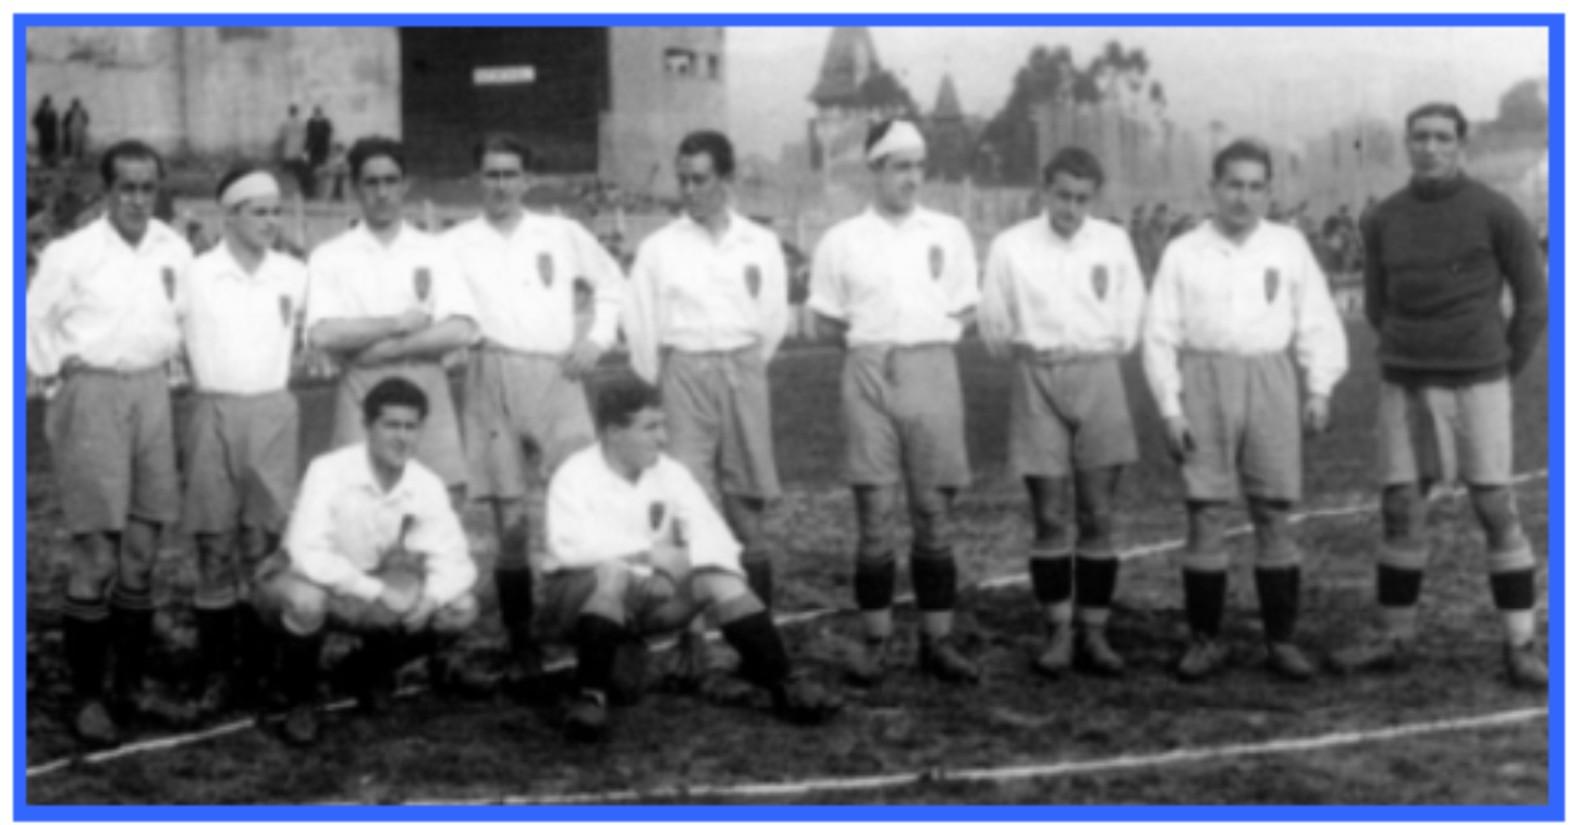 20101127222601-plantilla-real-zaragoza-1933-1934.jpg